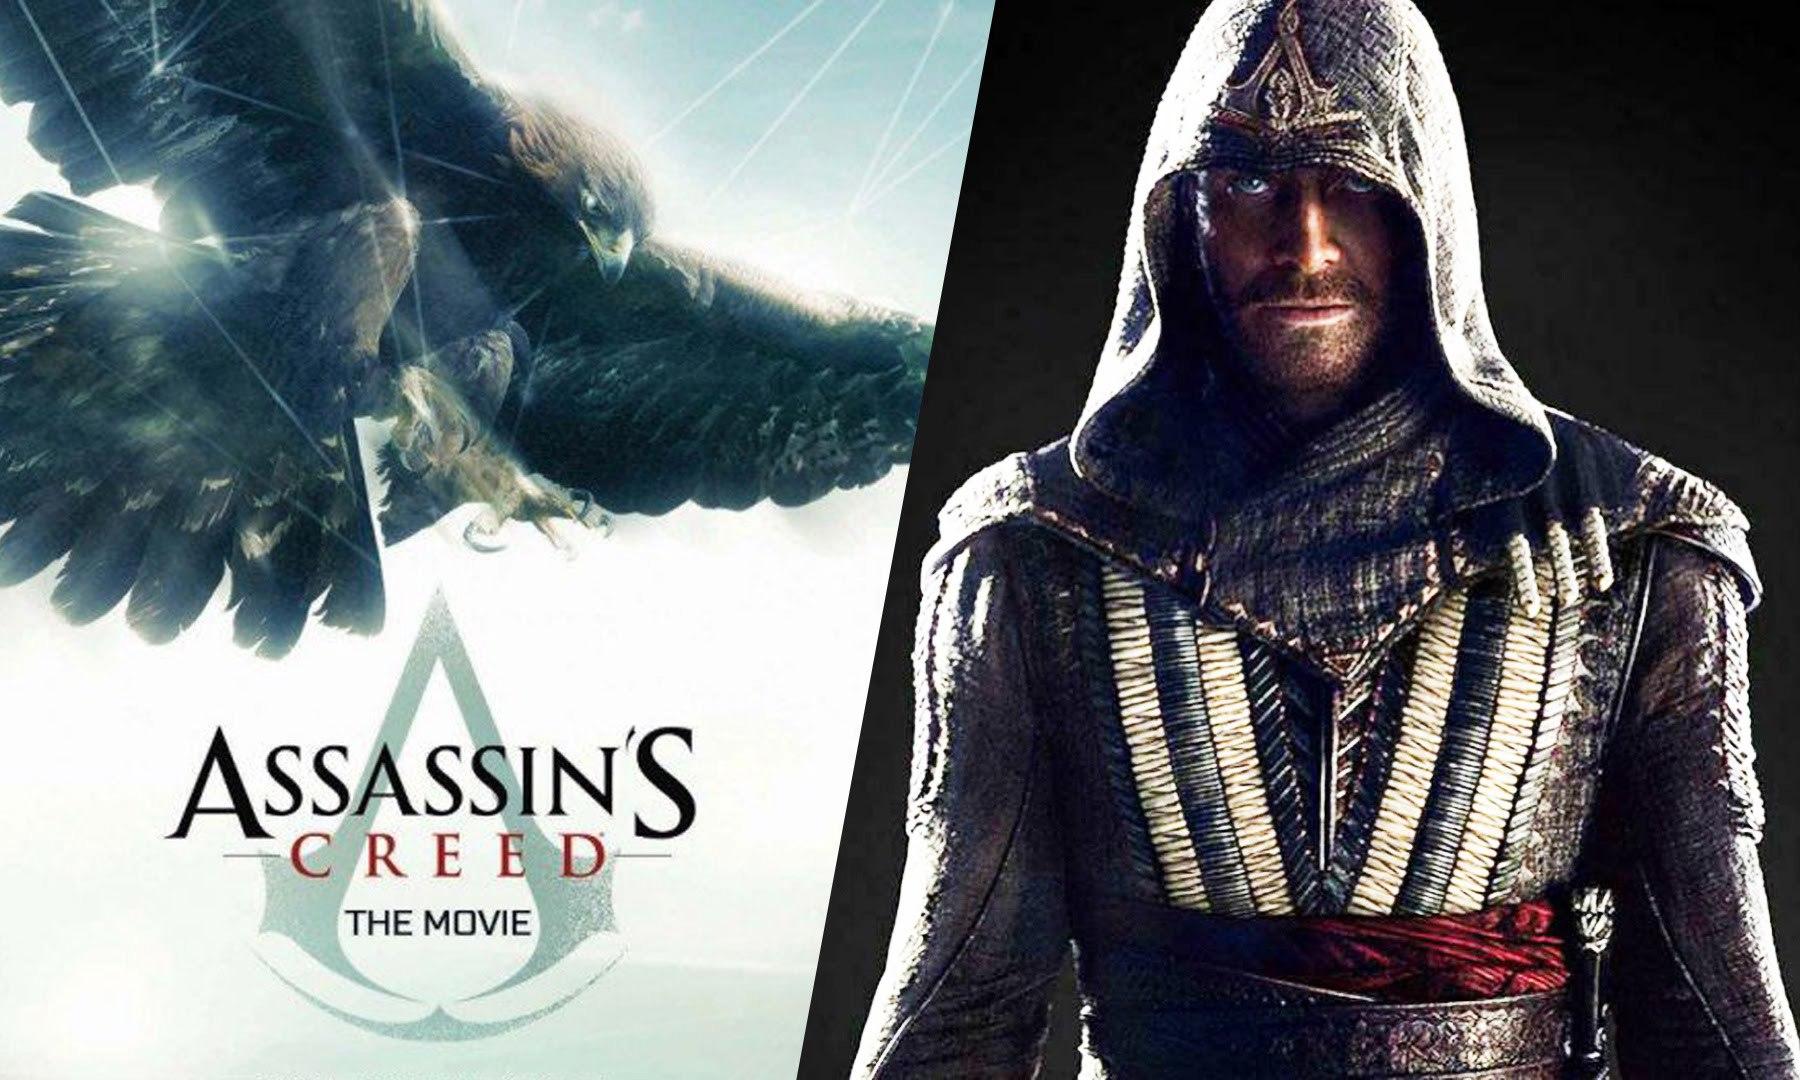 Assassin's Creed Movies Photos